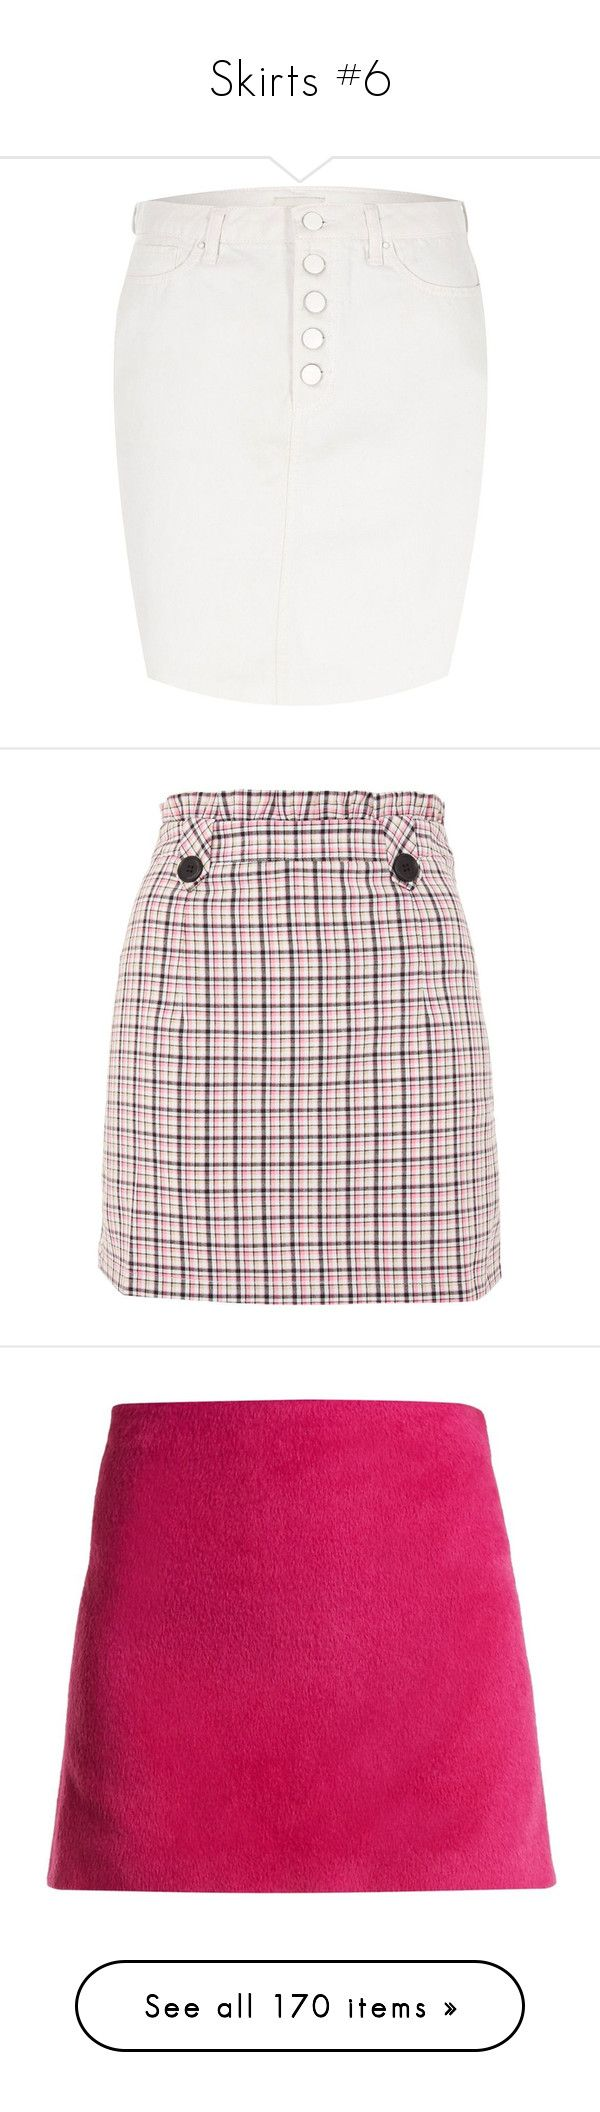 """Skirts #6"" by webuildbridgesnotwalls ❤ liked on Polyvore featuring skirts, mini skirts, cream, women, high waisted denim mini skirt, short mini skirts, high-waist skirt, high waisted denim skirt, short skirt and checkered mini skirt"